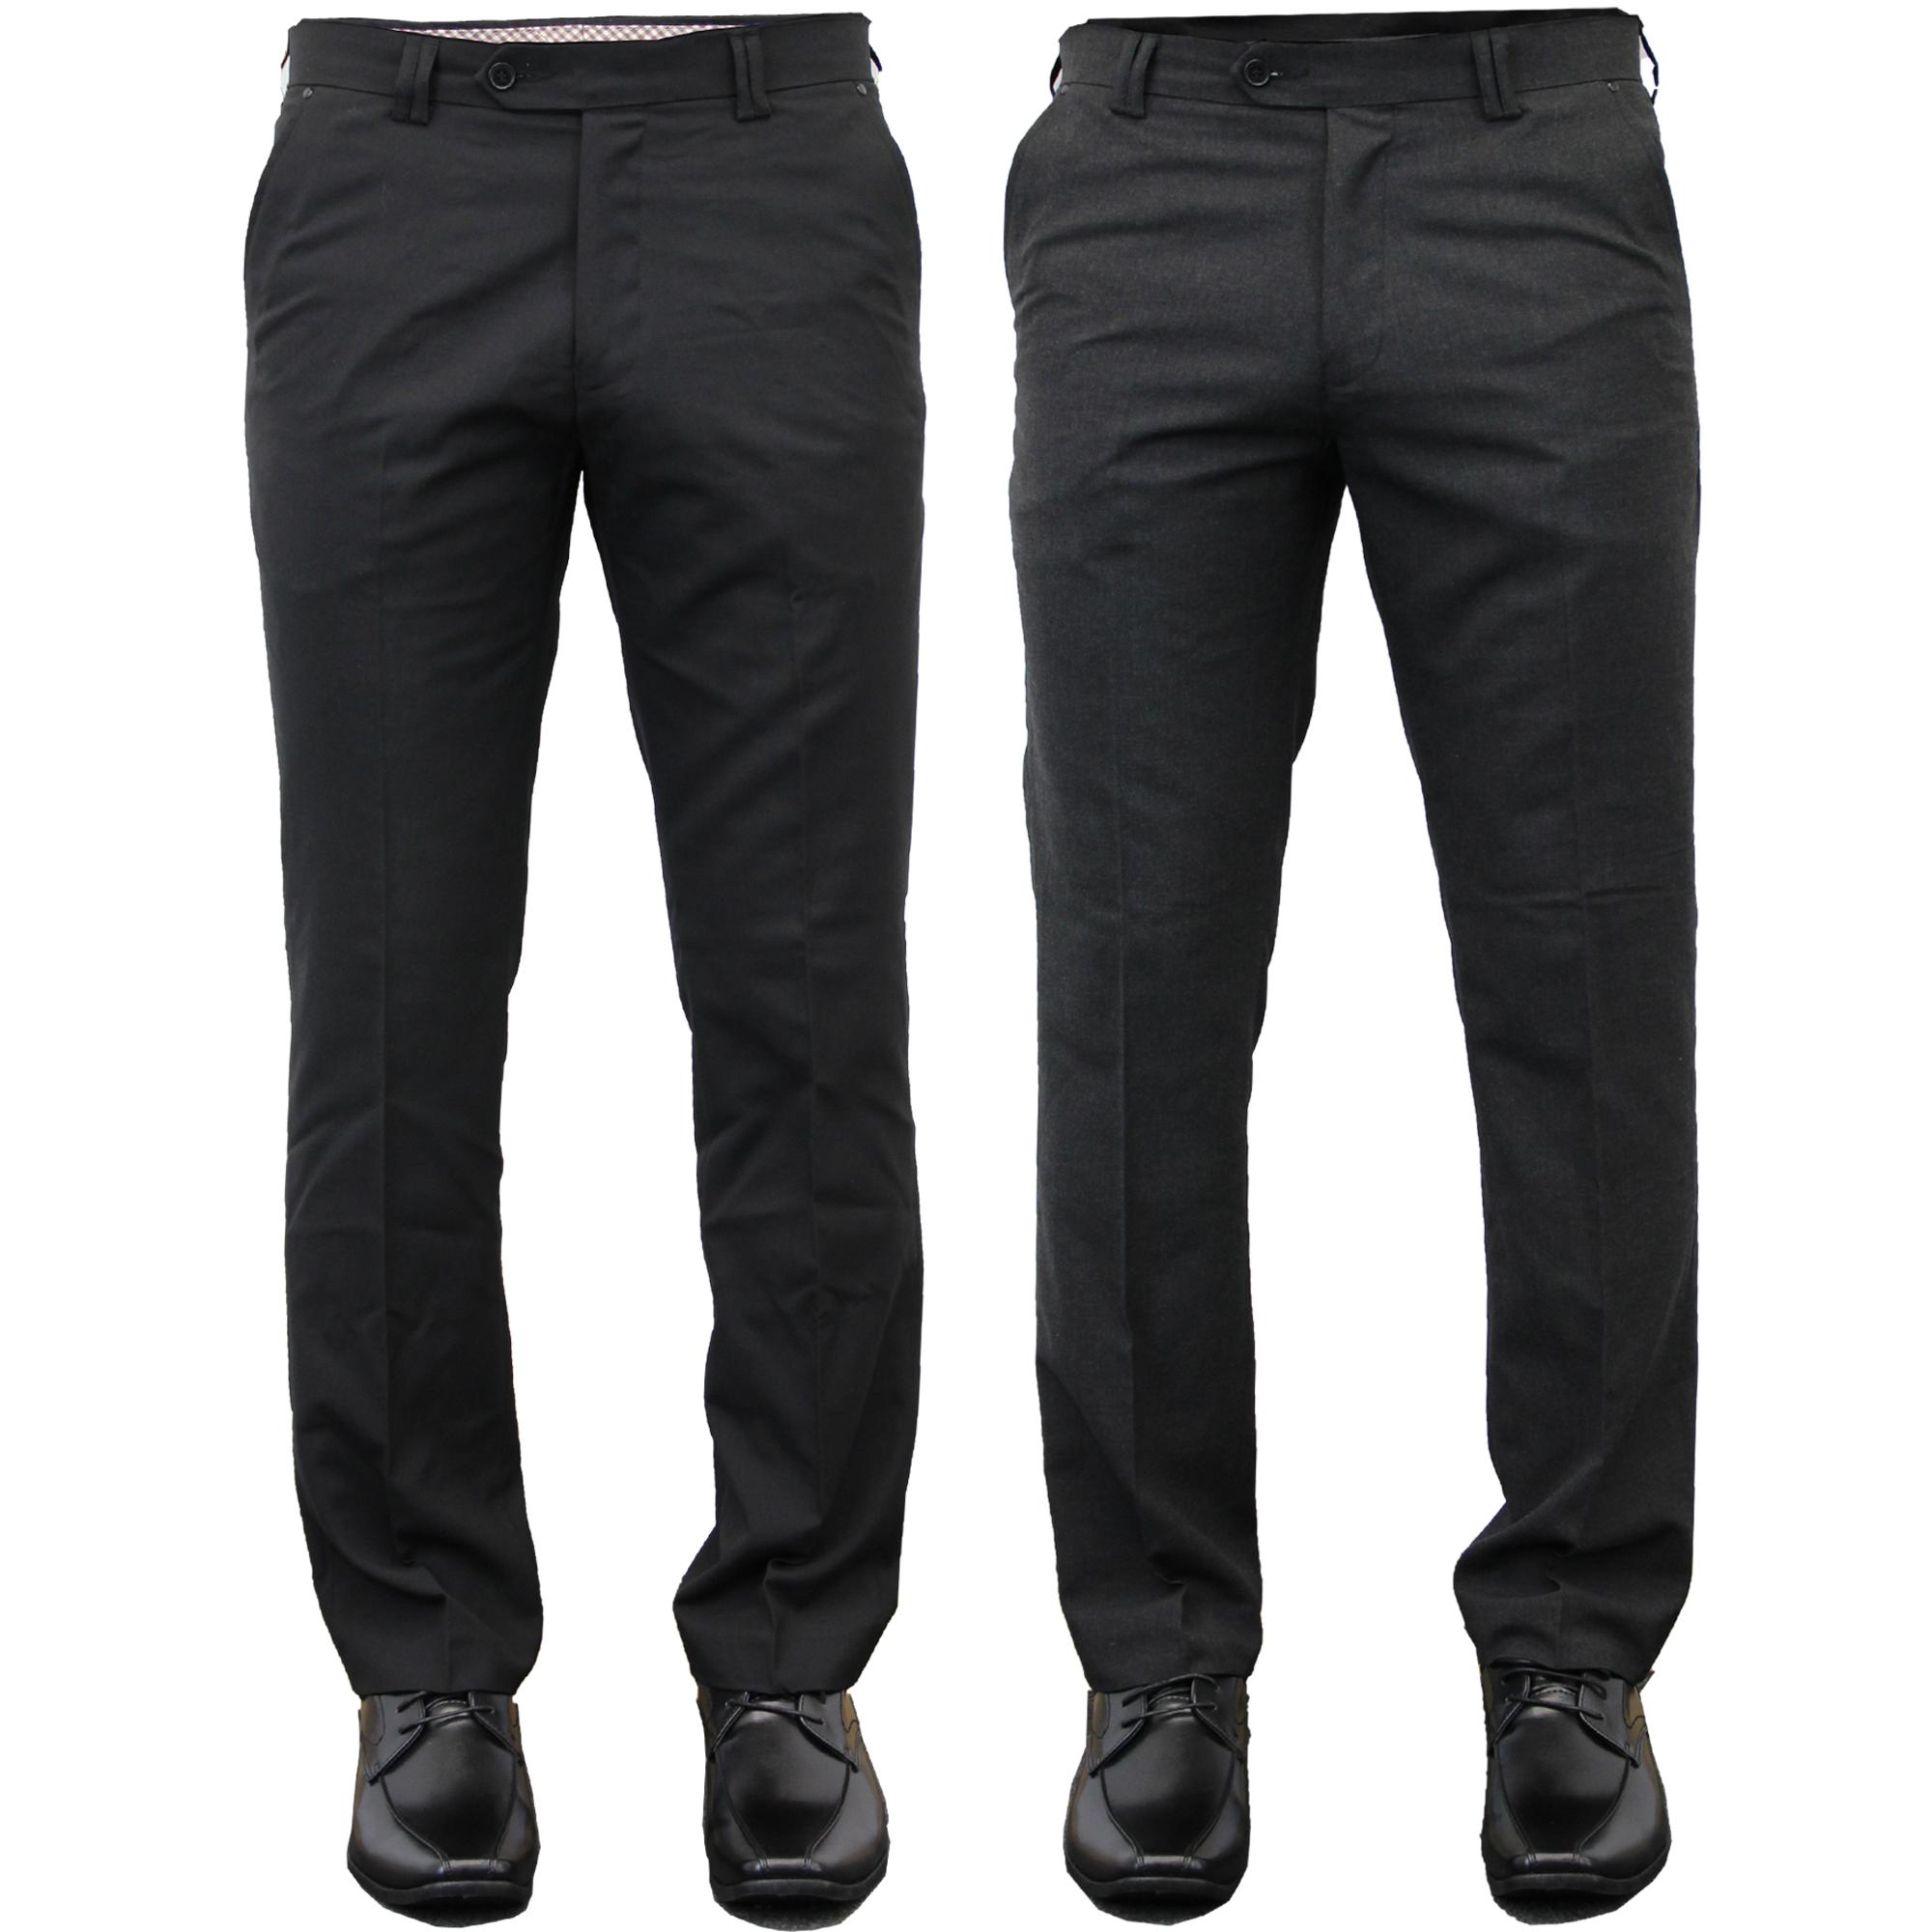 Mens-Trouser-Soul-London-Formal-Dress-Pant-Office-